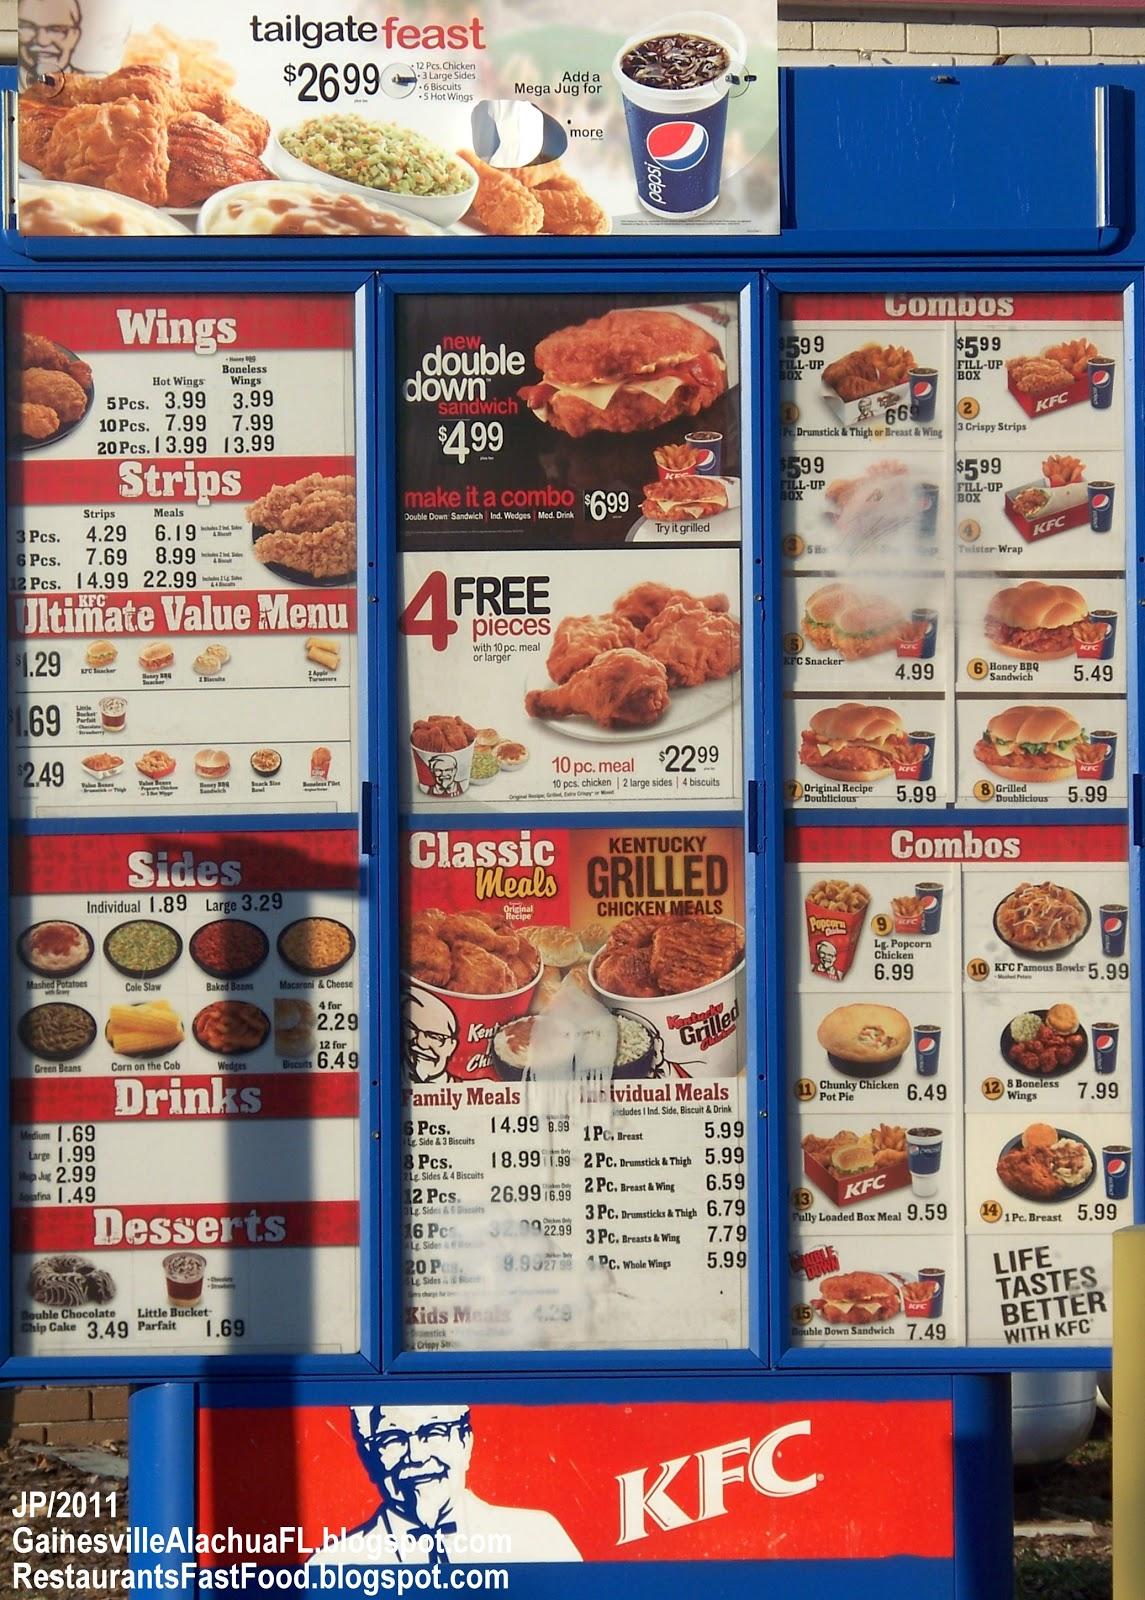 Kfc Food Menu Prices Kfc Menu Prices Have Kfc Menu